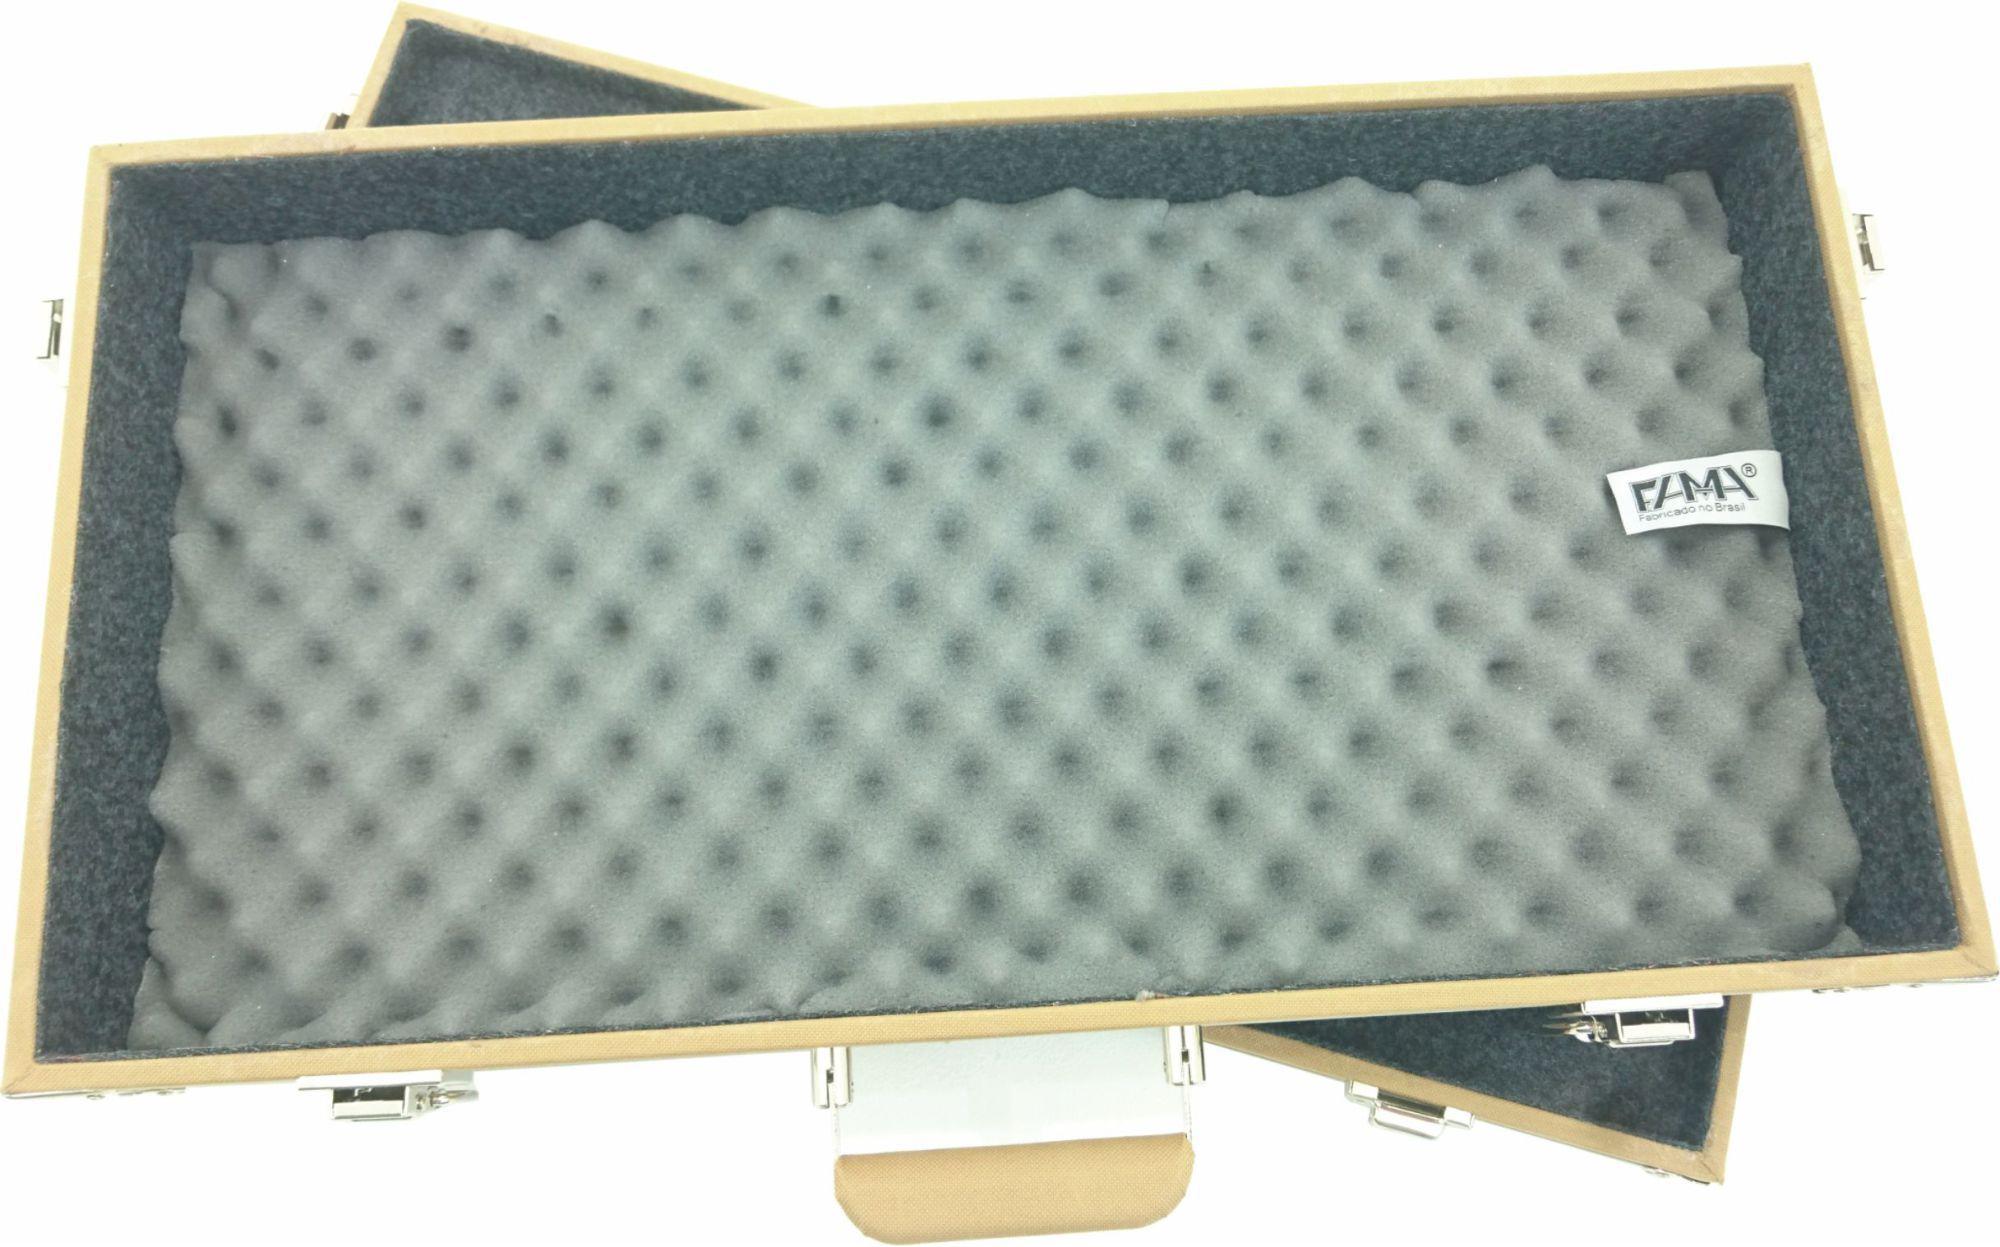 Case Pedais Pedaleira Boss Line6 Gt10 Zoom Tweed Fama